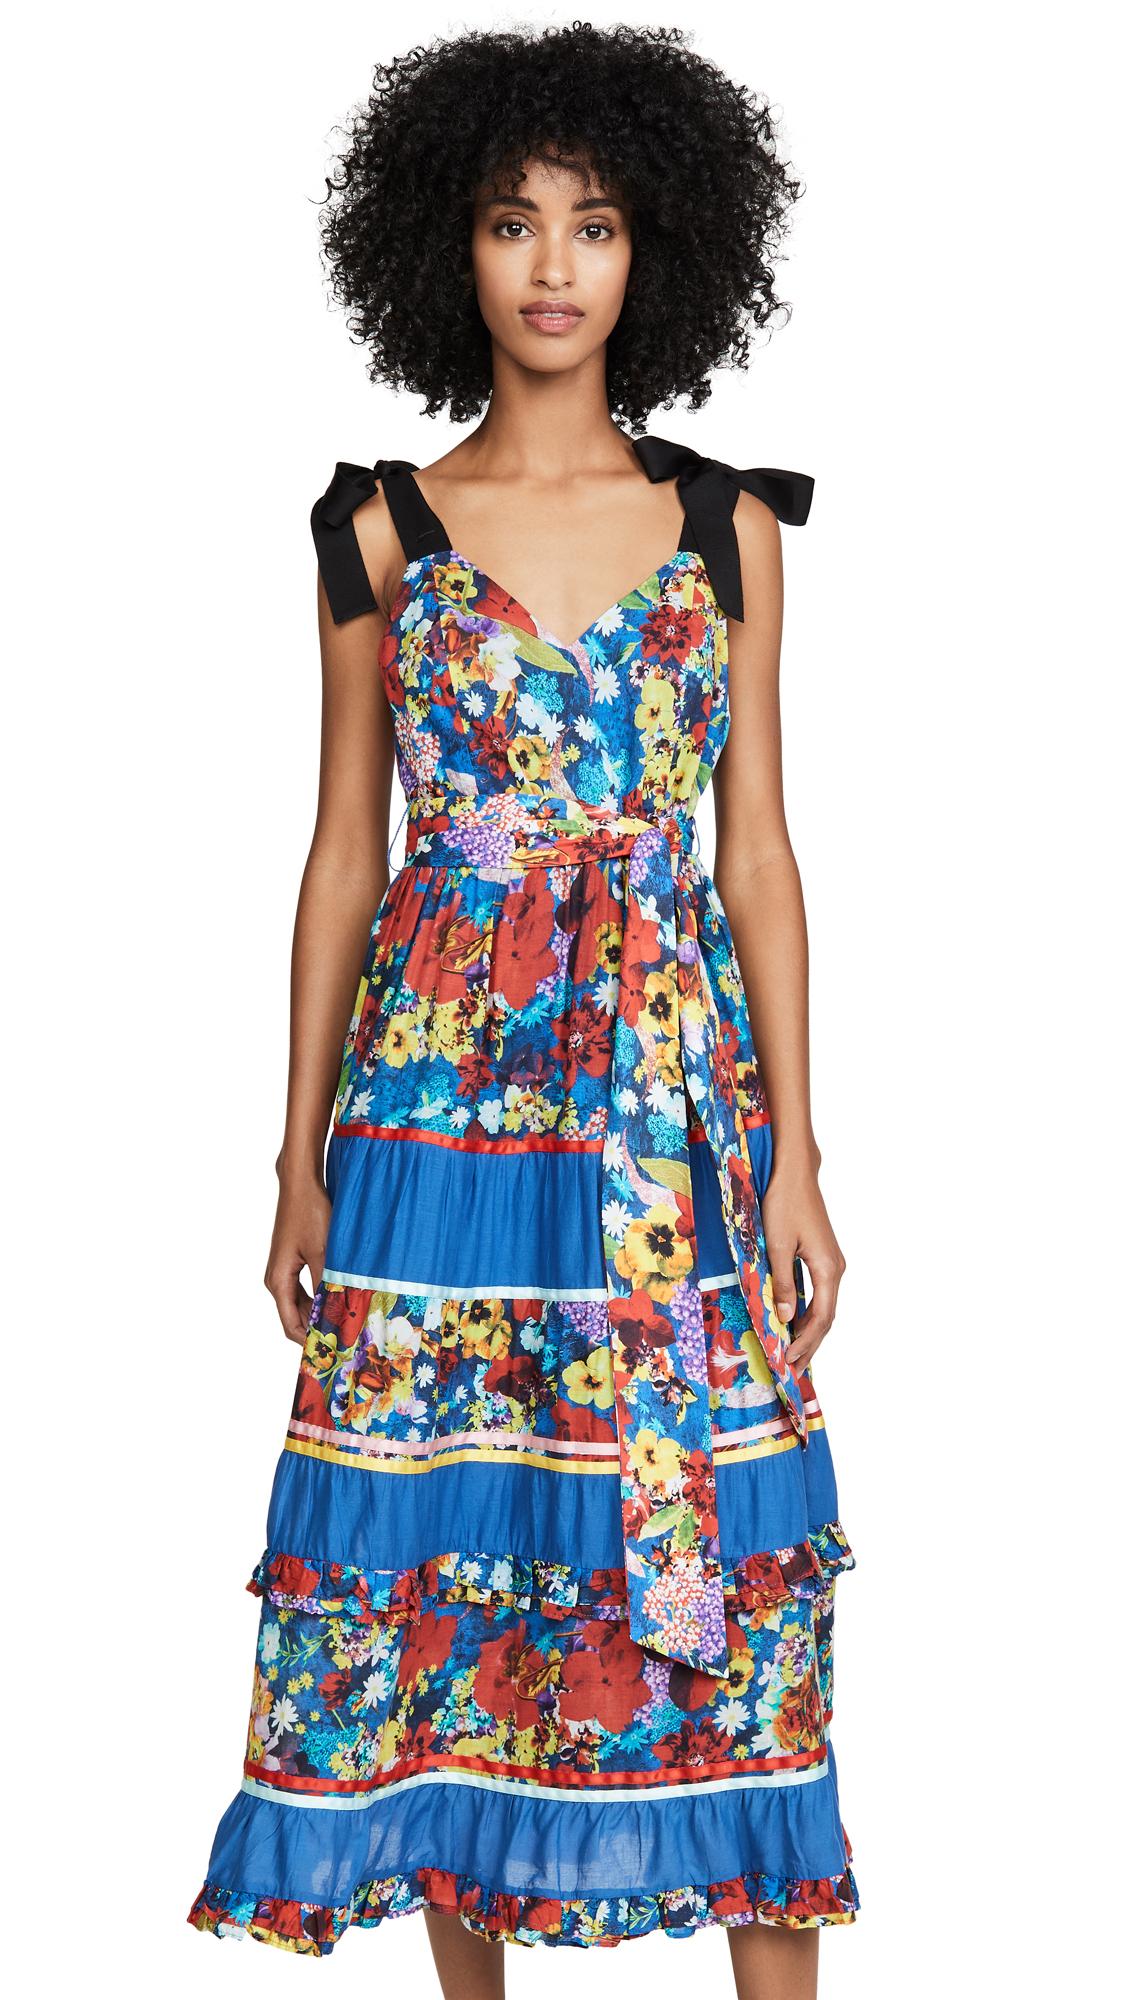 alice + olivia Gayla Tiered Midi Dress - Colorful Blossom Riviera